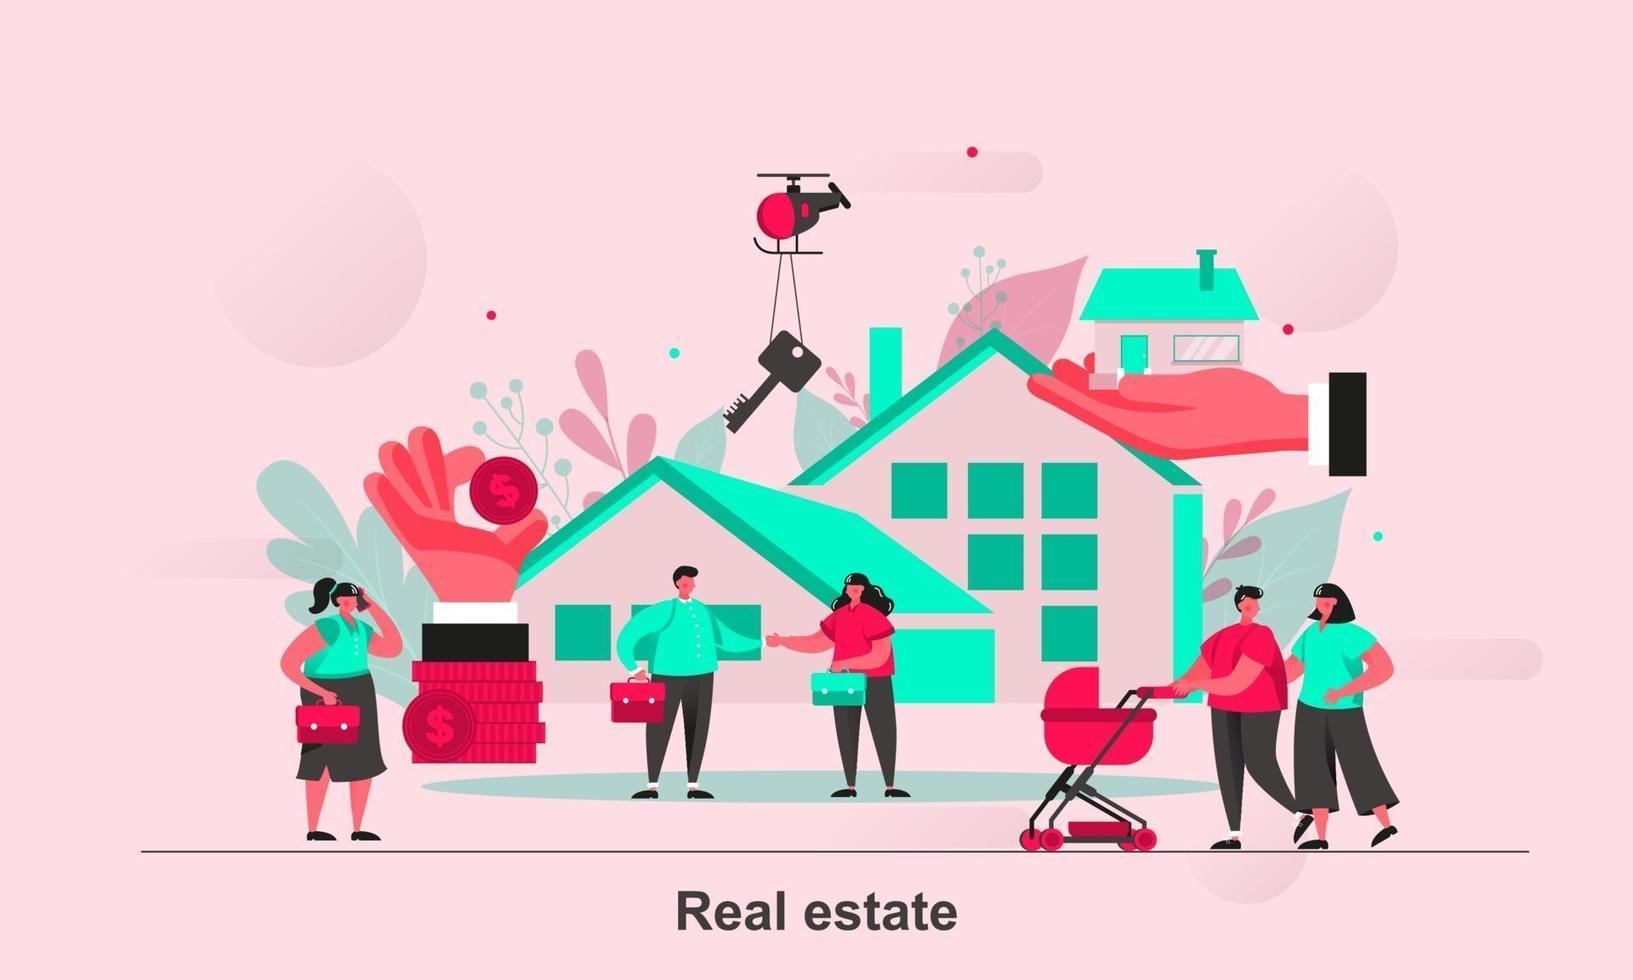 Real estate web concept design in flat style vector illustration